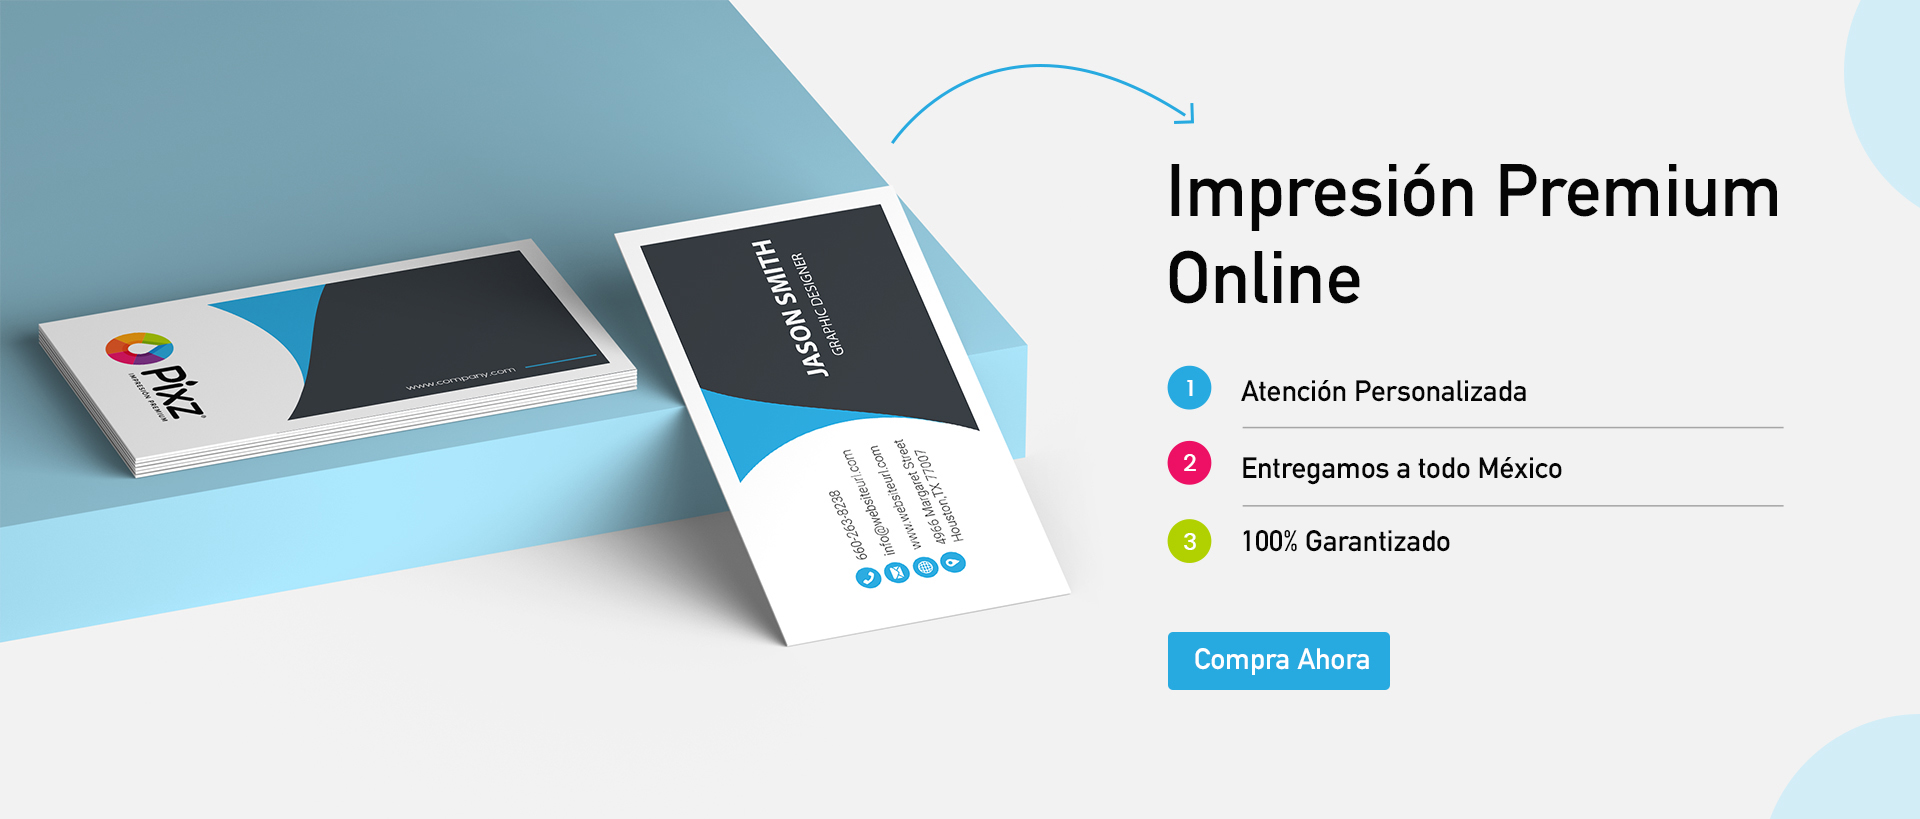 Impresion Premium Pixz